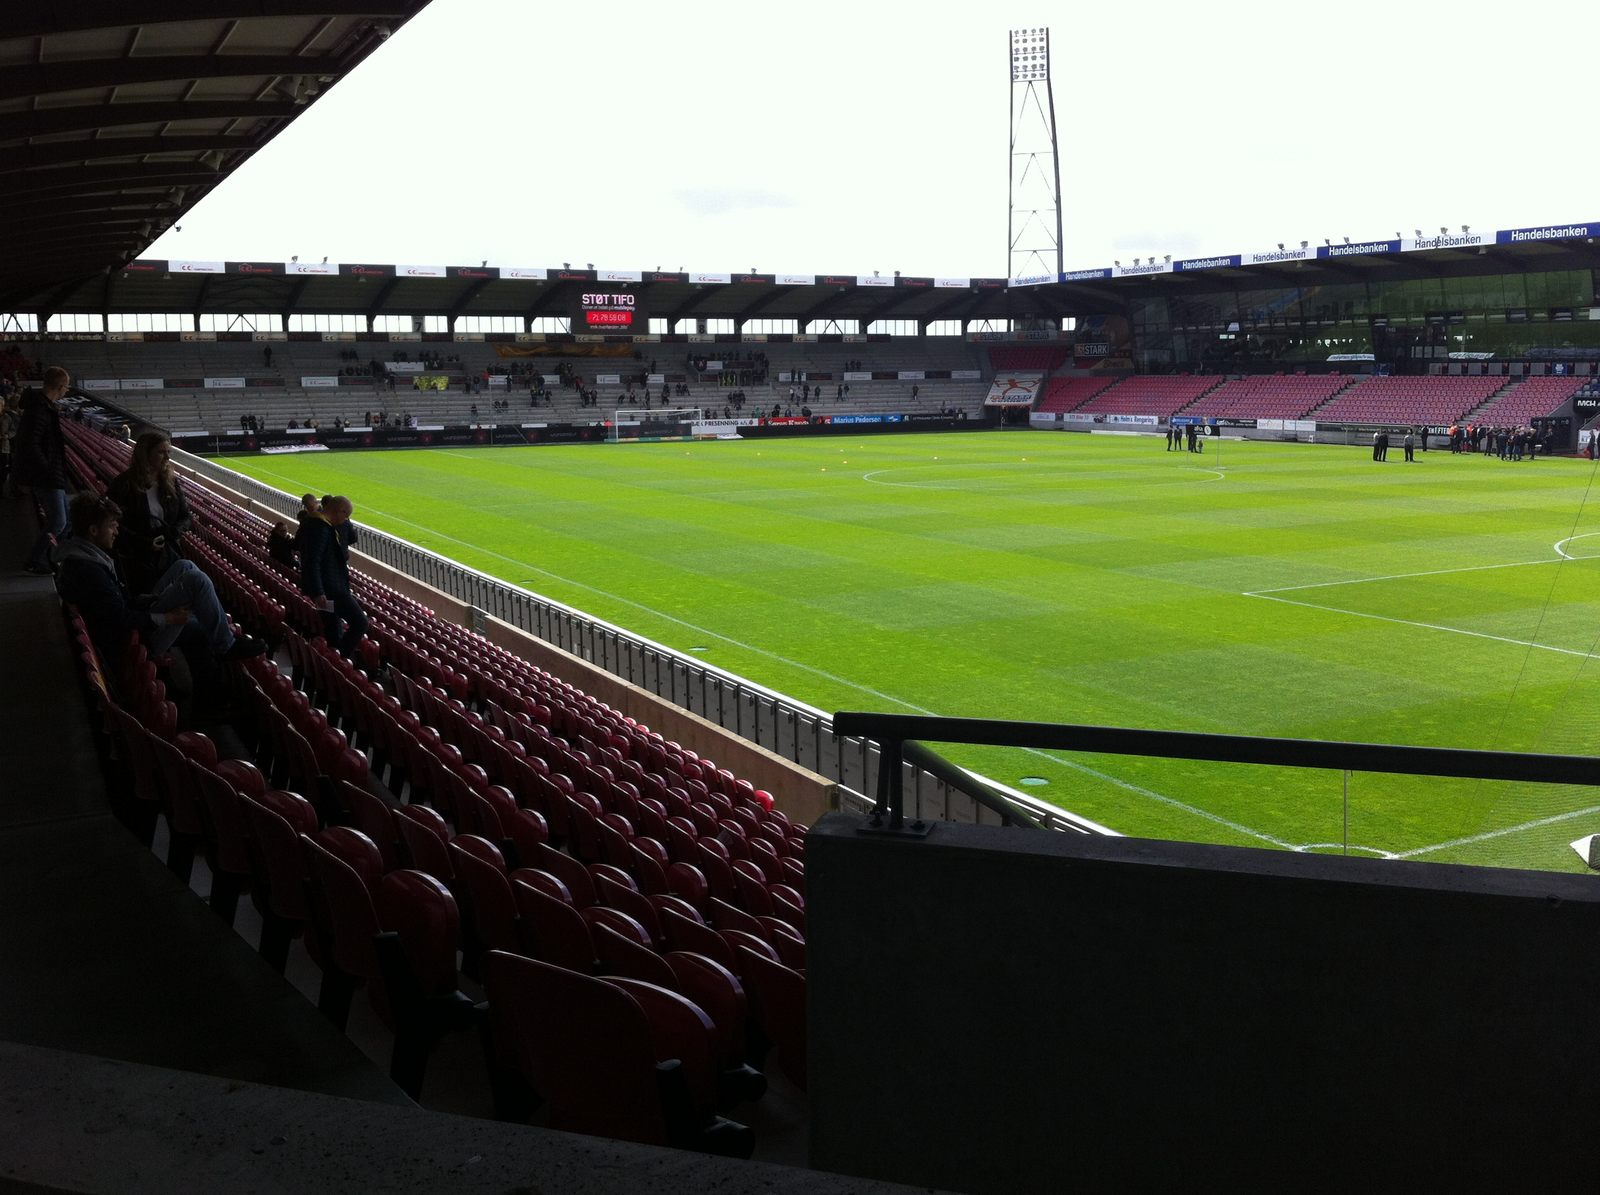 Herning Arena